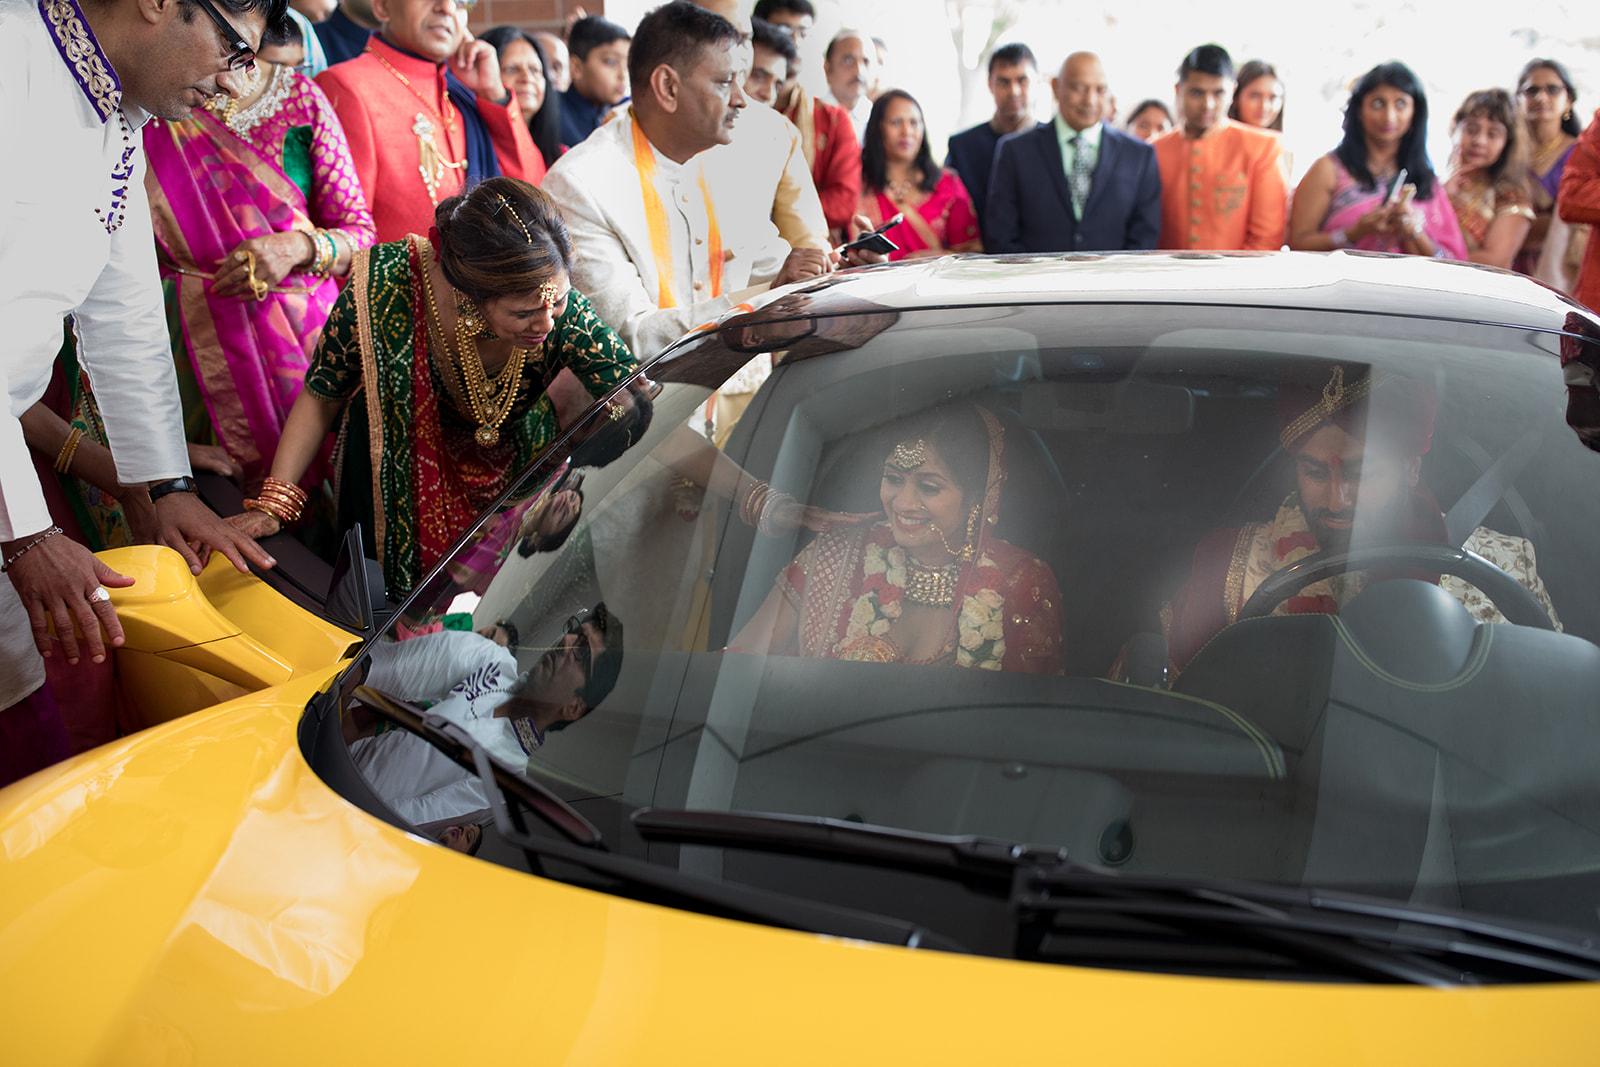 Le Cape Weddings - Vidai - Rimi and Rohun -20.jpg